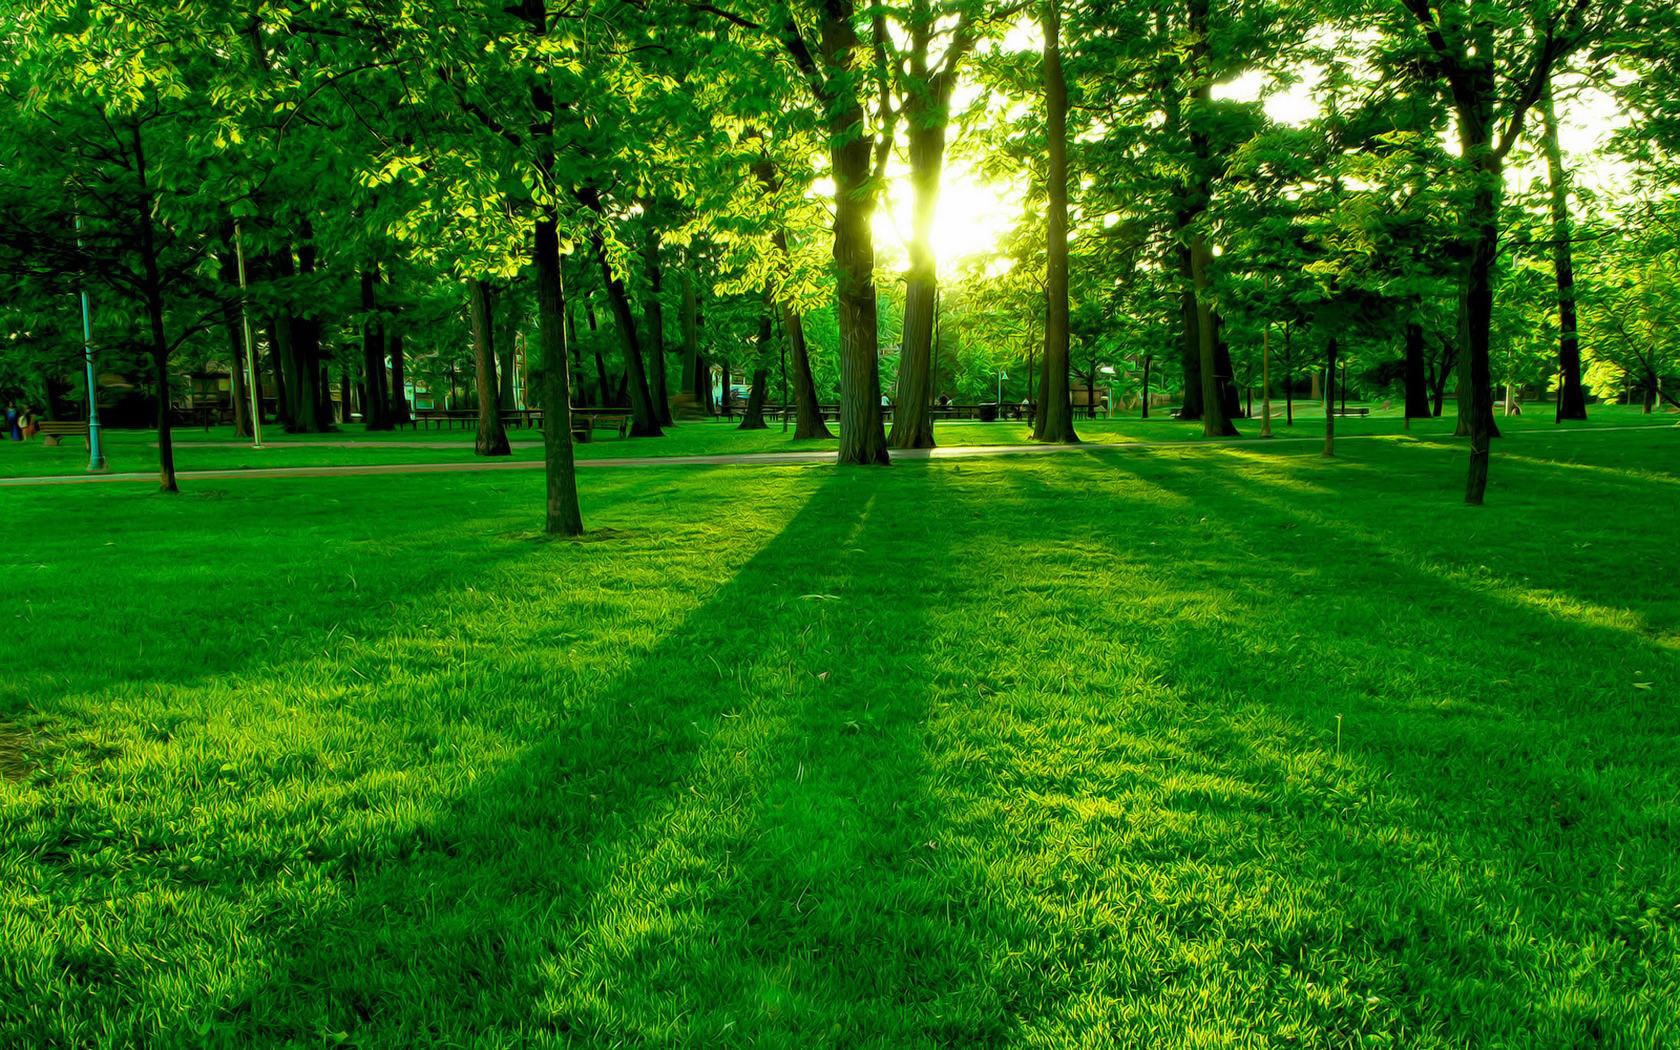 Hd wallpaper landscape - Green Spring Landscape Wallpaper Desktop Background Scenery